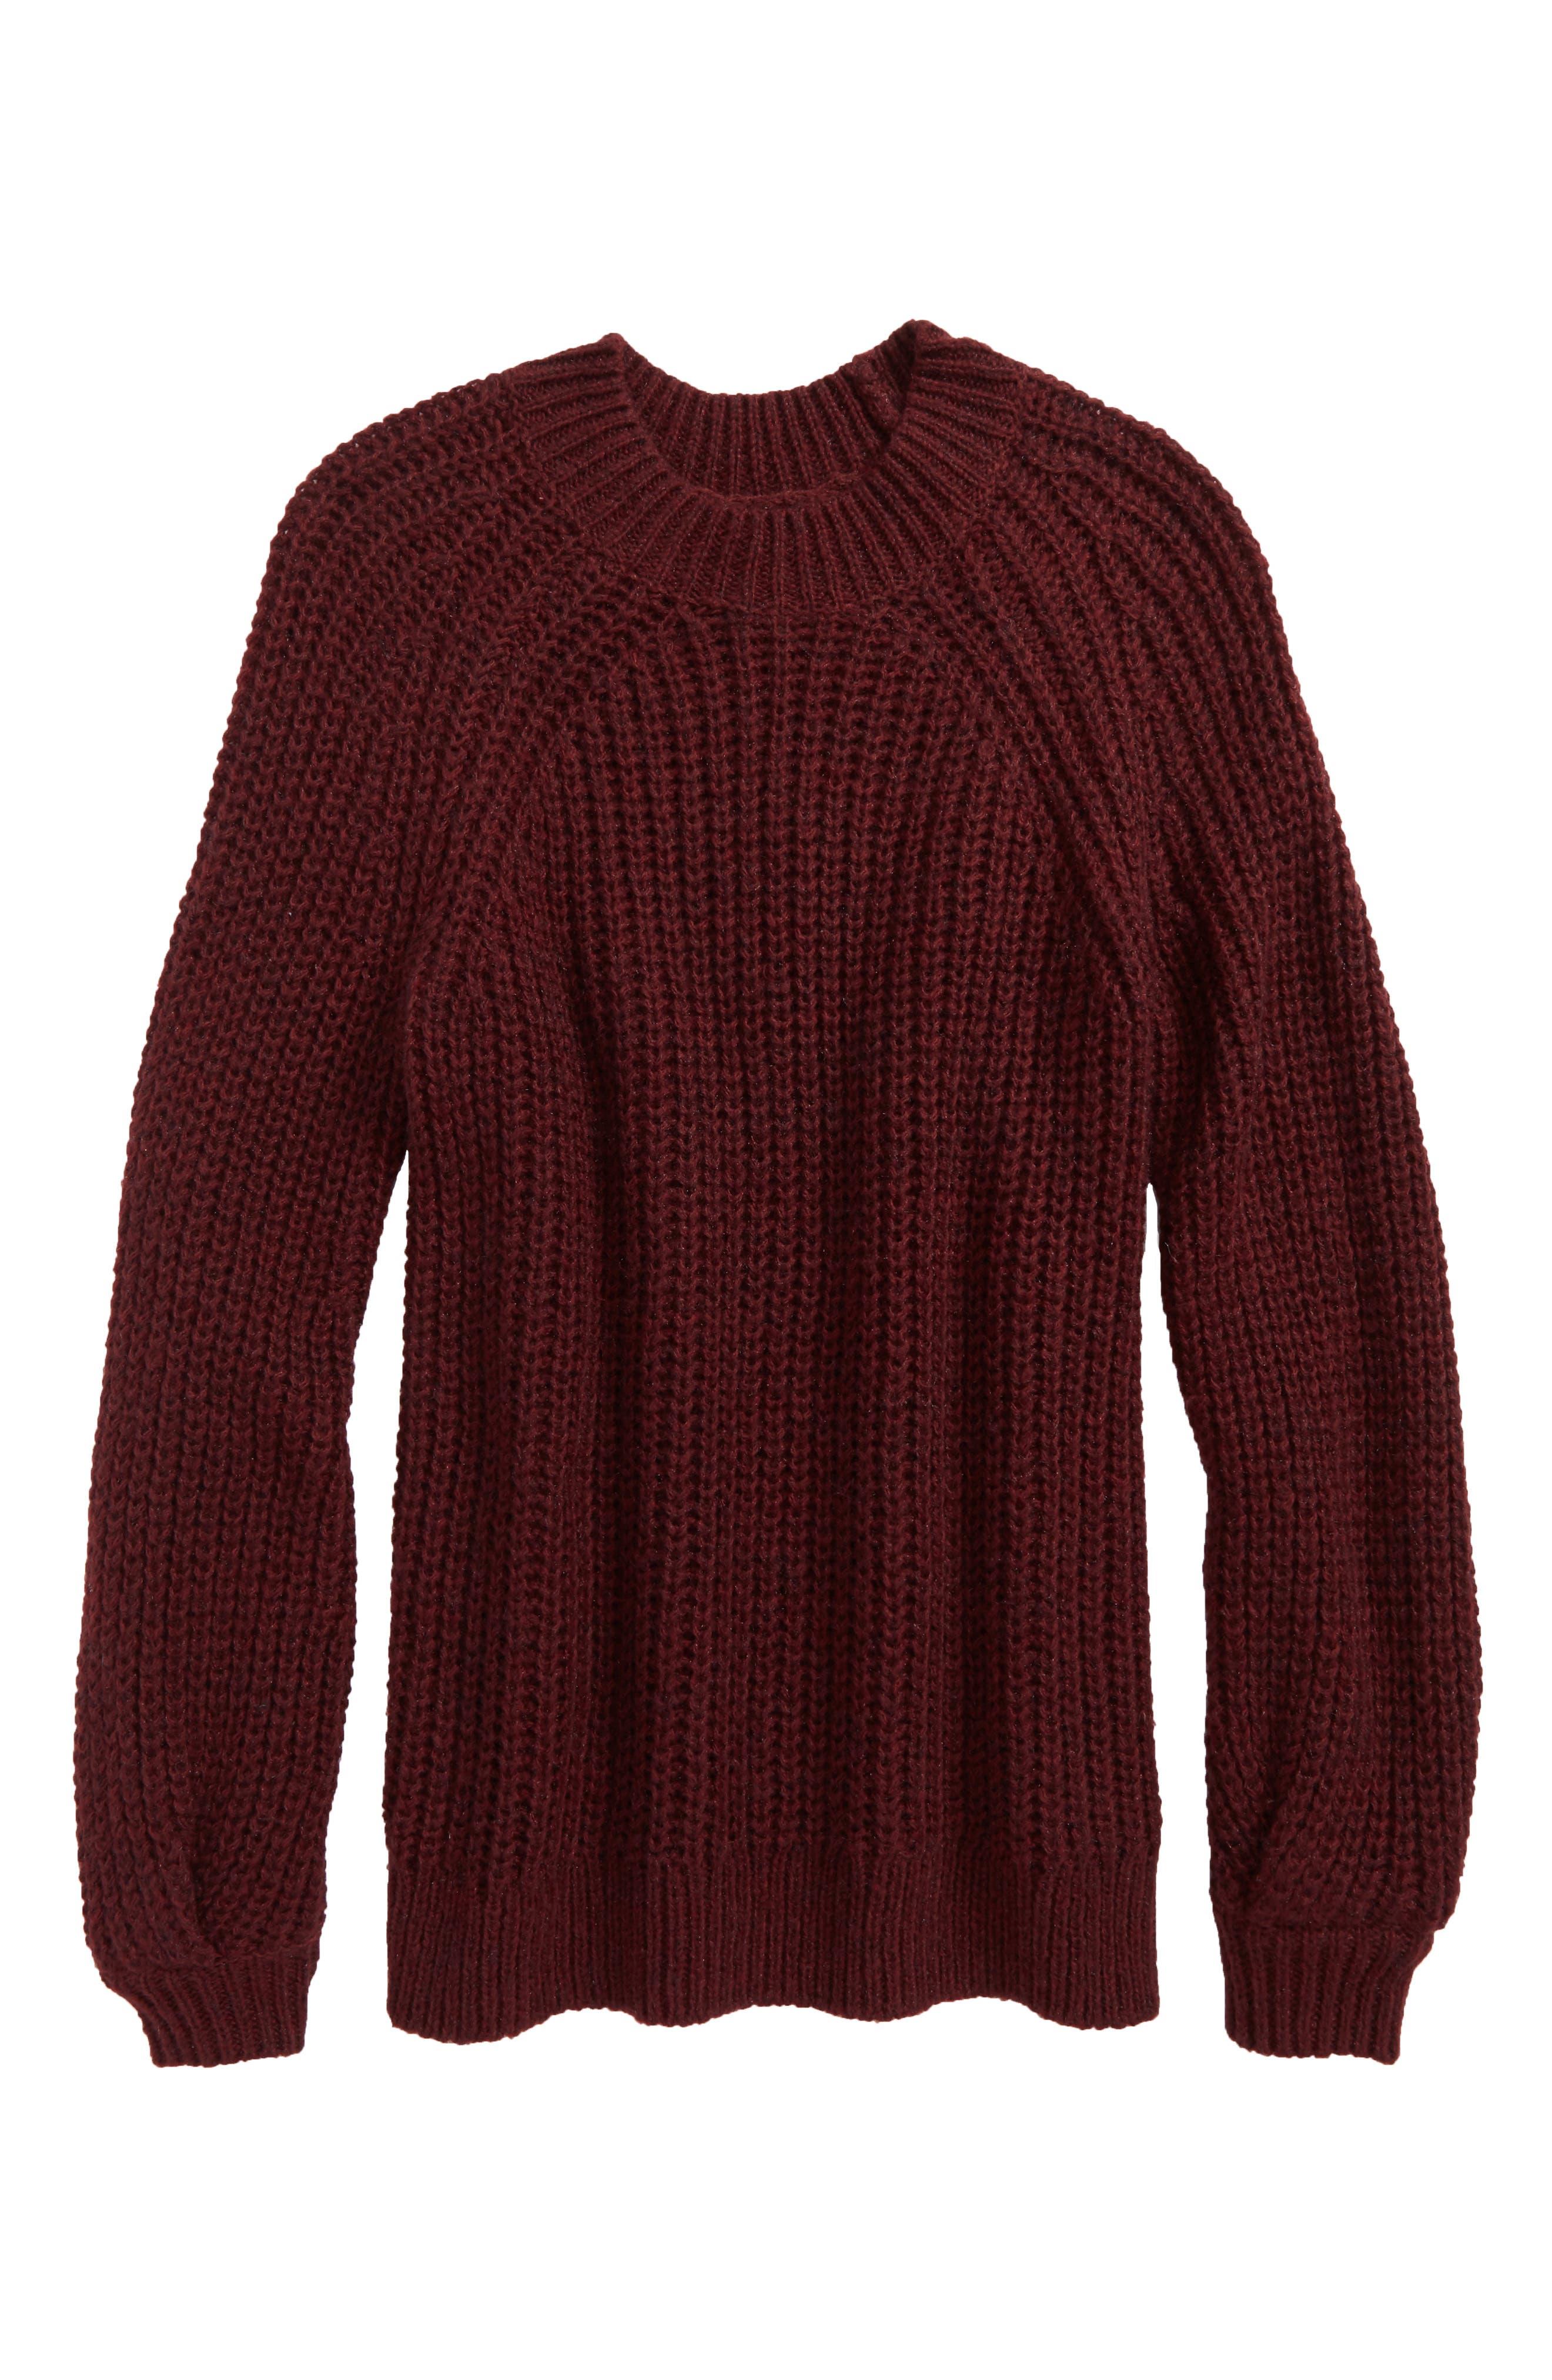 Bubble Sleeve Sweater,                             Main thumbnail 1, color,                             Burgundy Royale